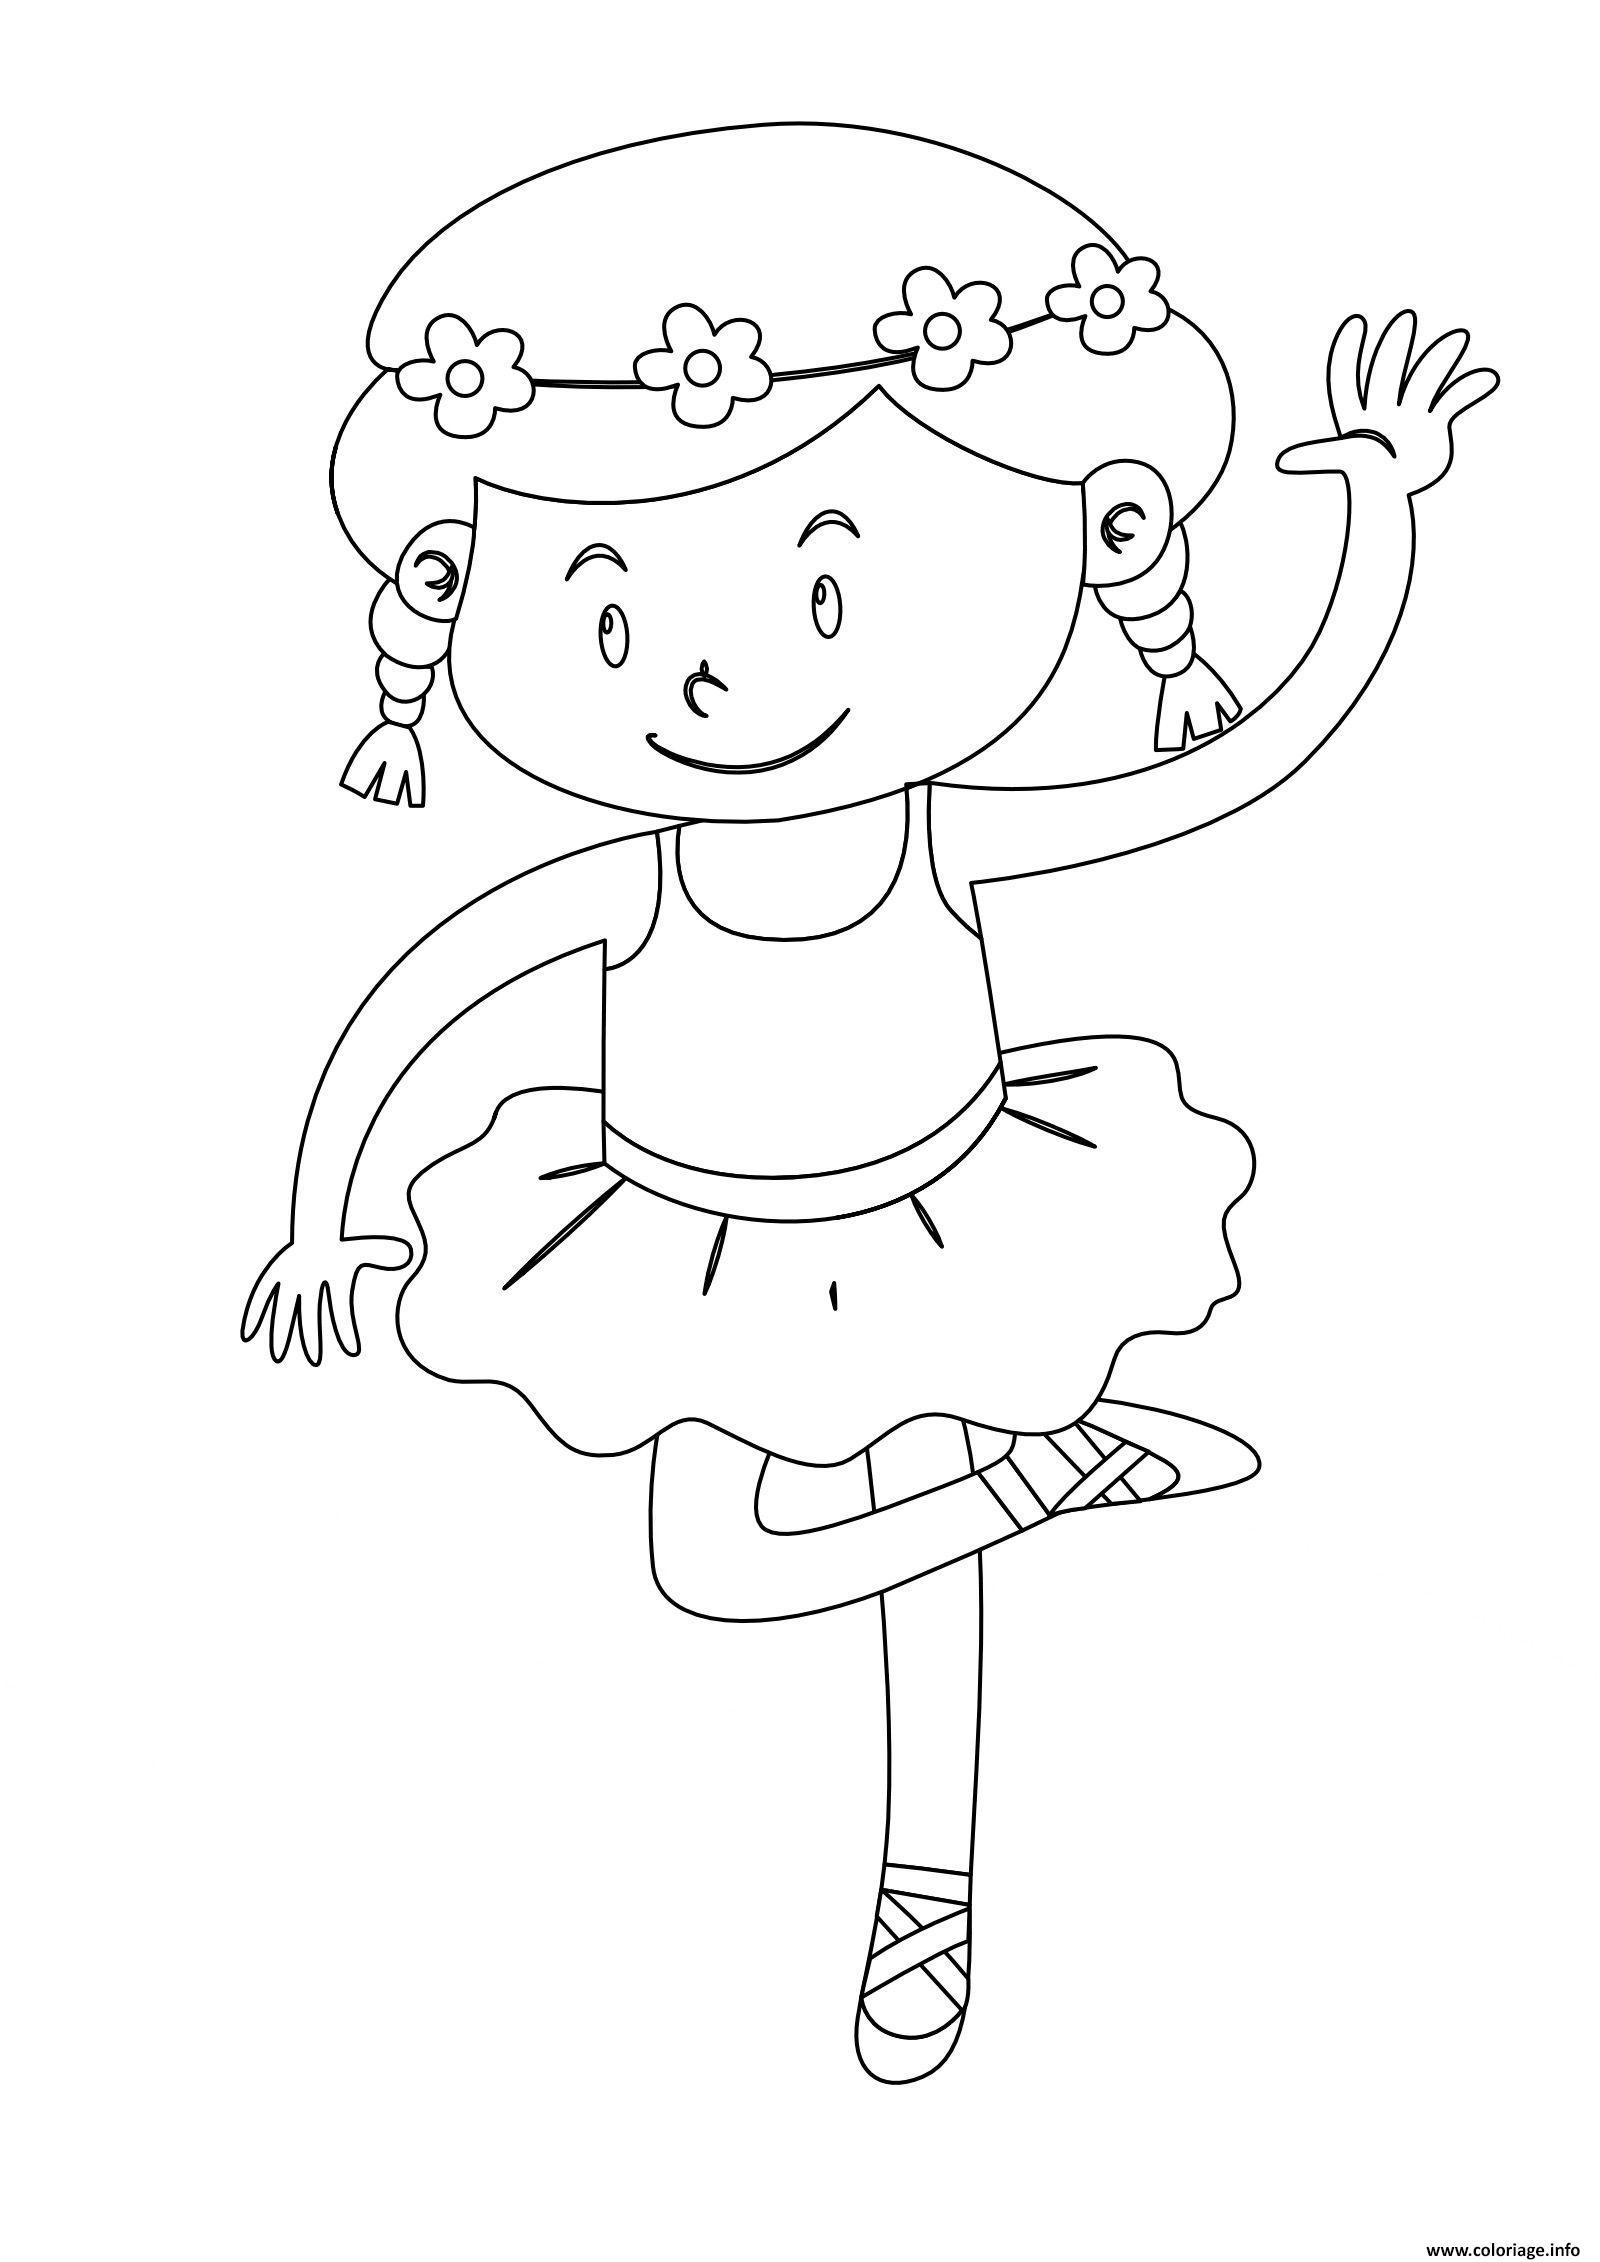 Dessin danseuse petite fille Coloriage Gratuit à Imprimer